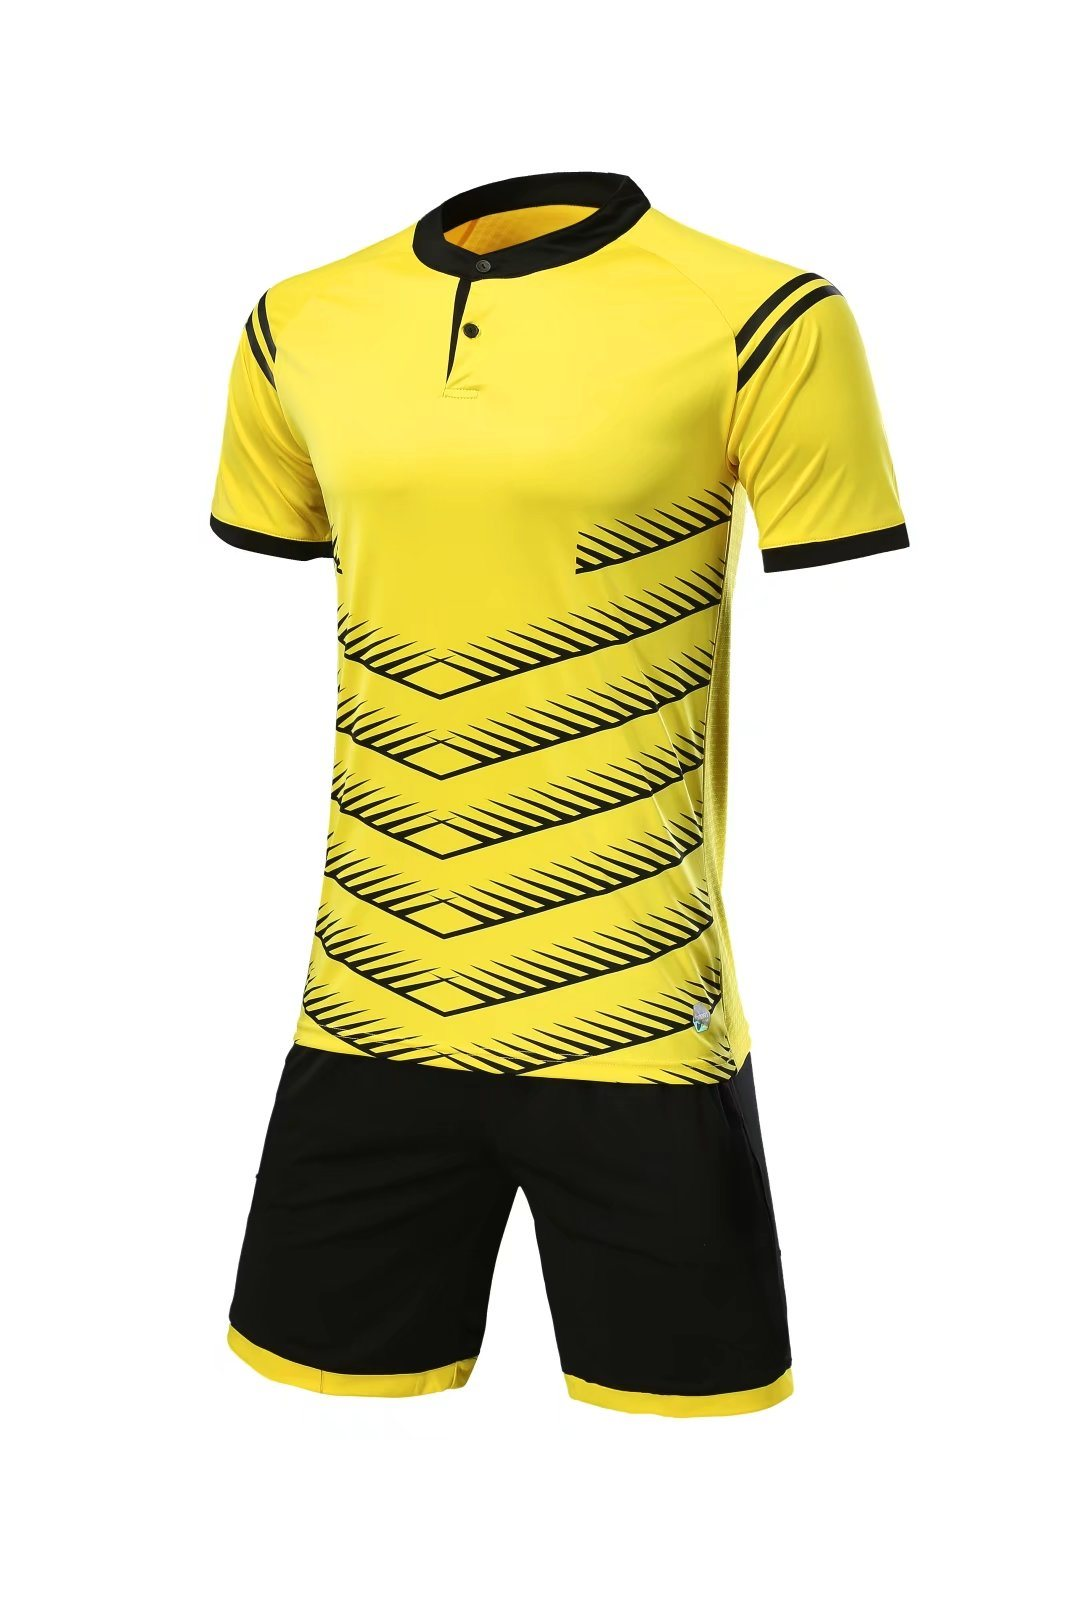 d78a82810 2018 New Style Custom Soccer Uniform Footballshirt Maker Soccer Jersey